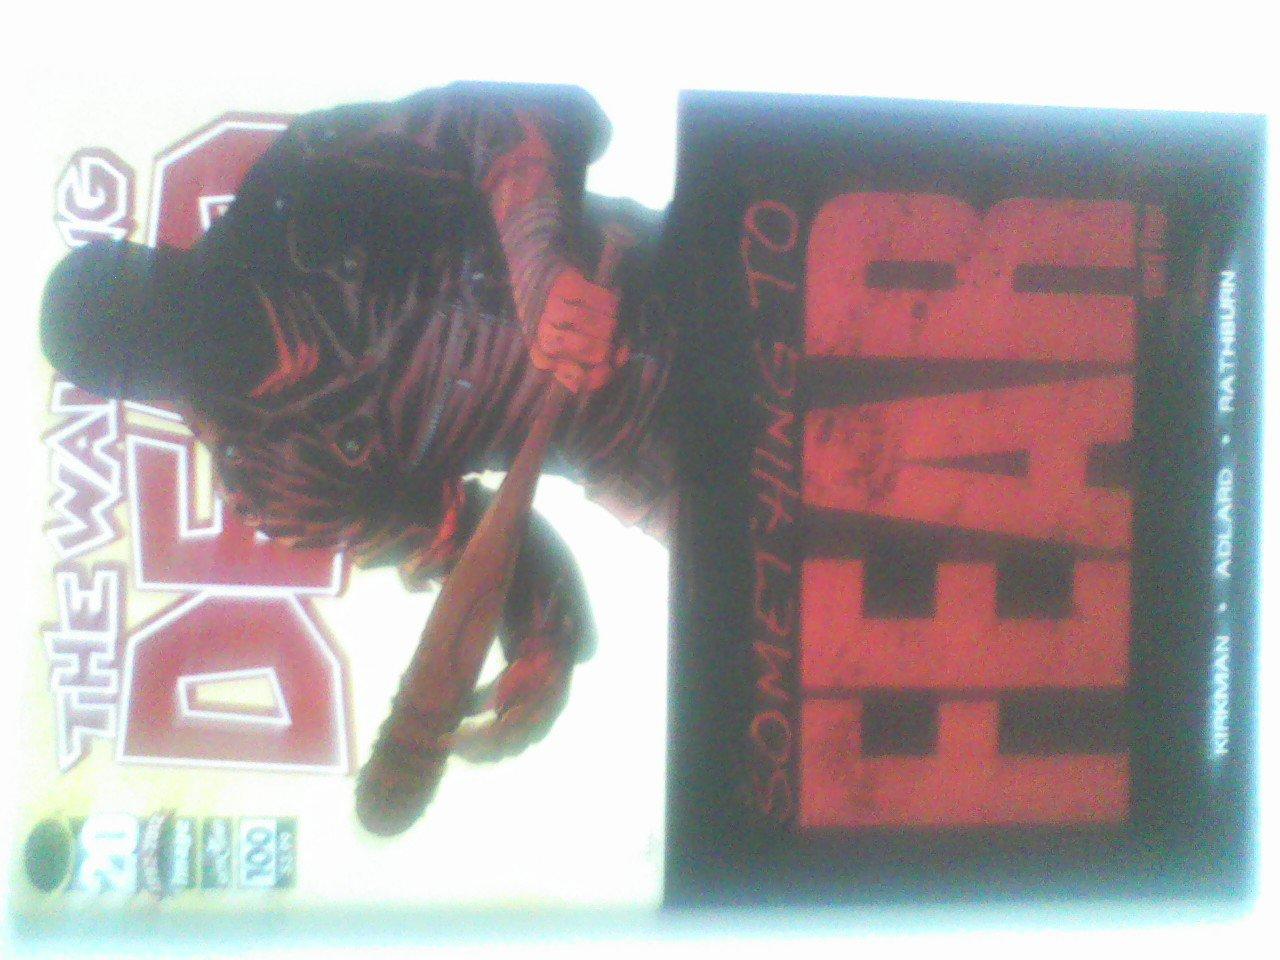 The Walking Dead #100 ,101, #102 ,#103,#115B, GCBD edition 2013